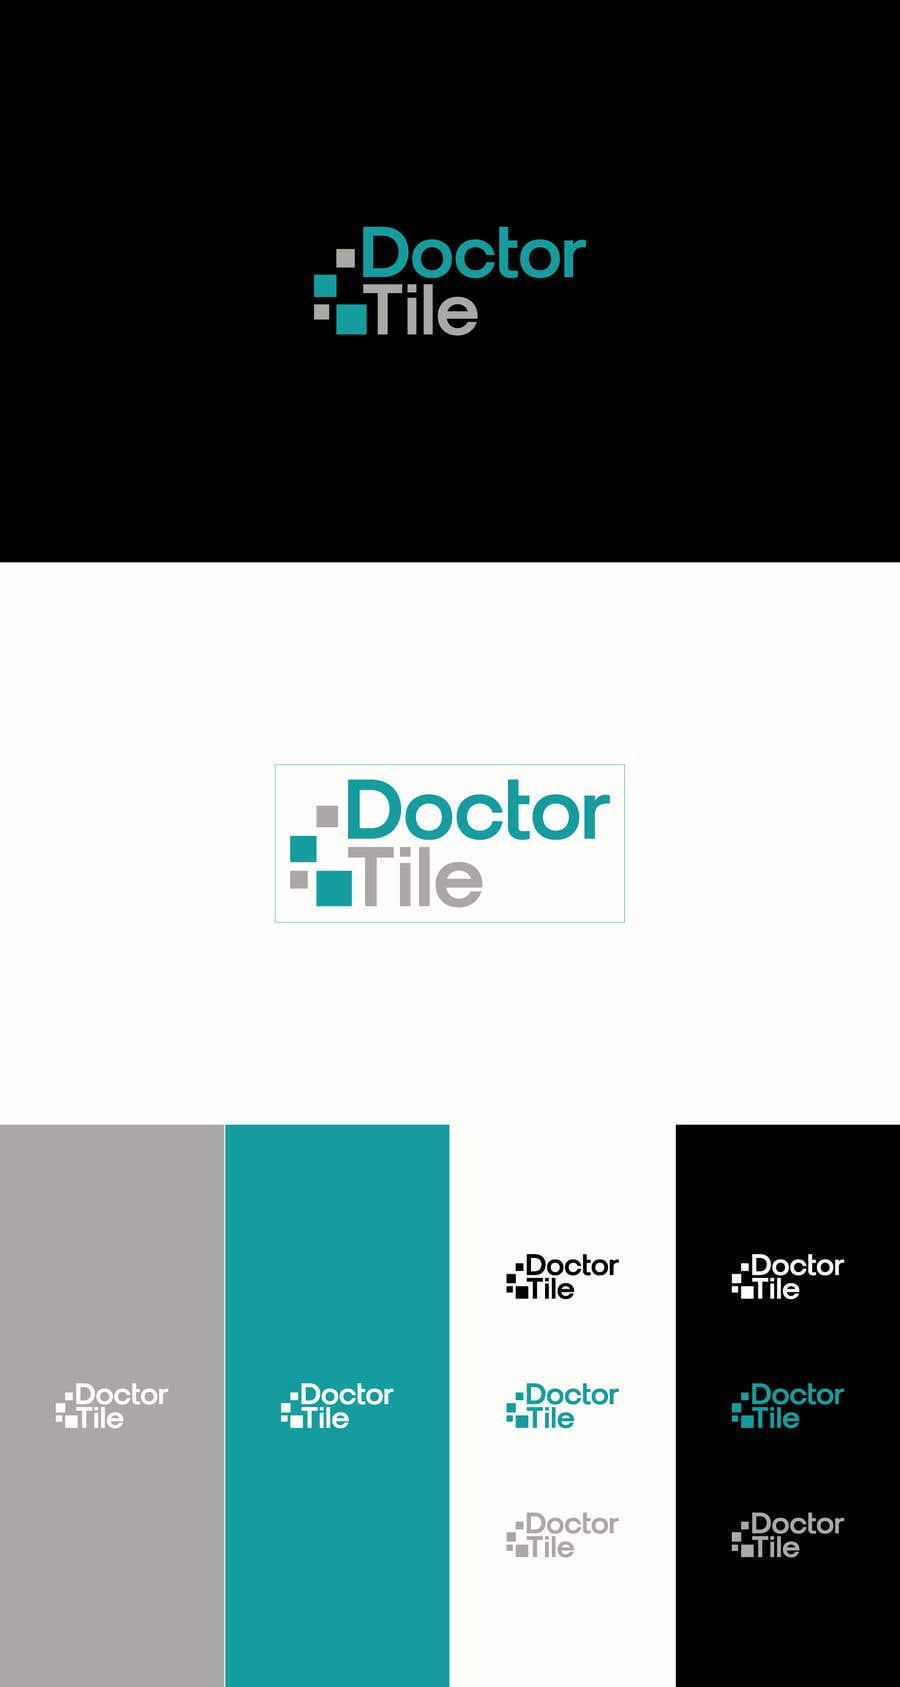 Contest Entry #11 for DoctorTile - Logo & Corporate Color Scheme